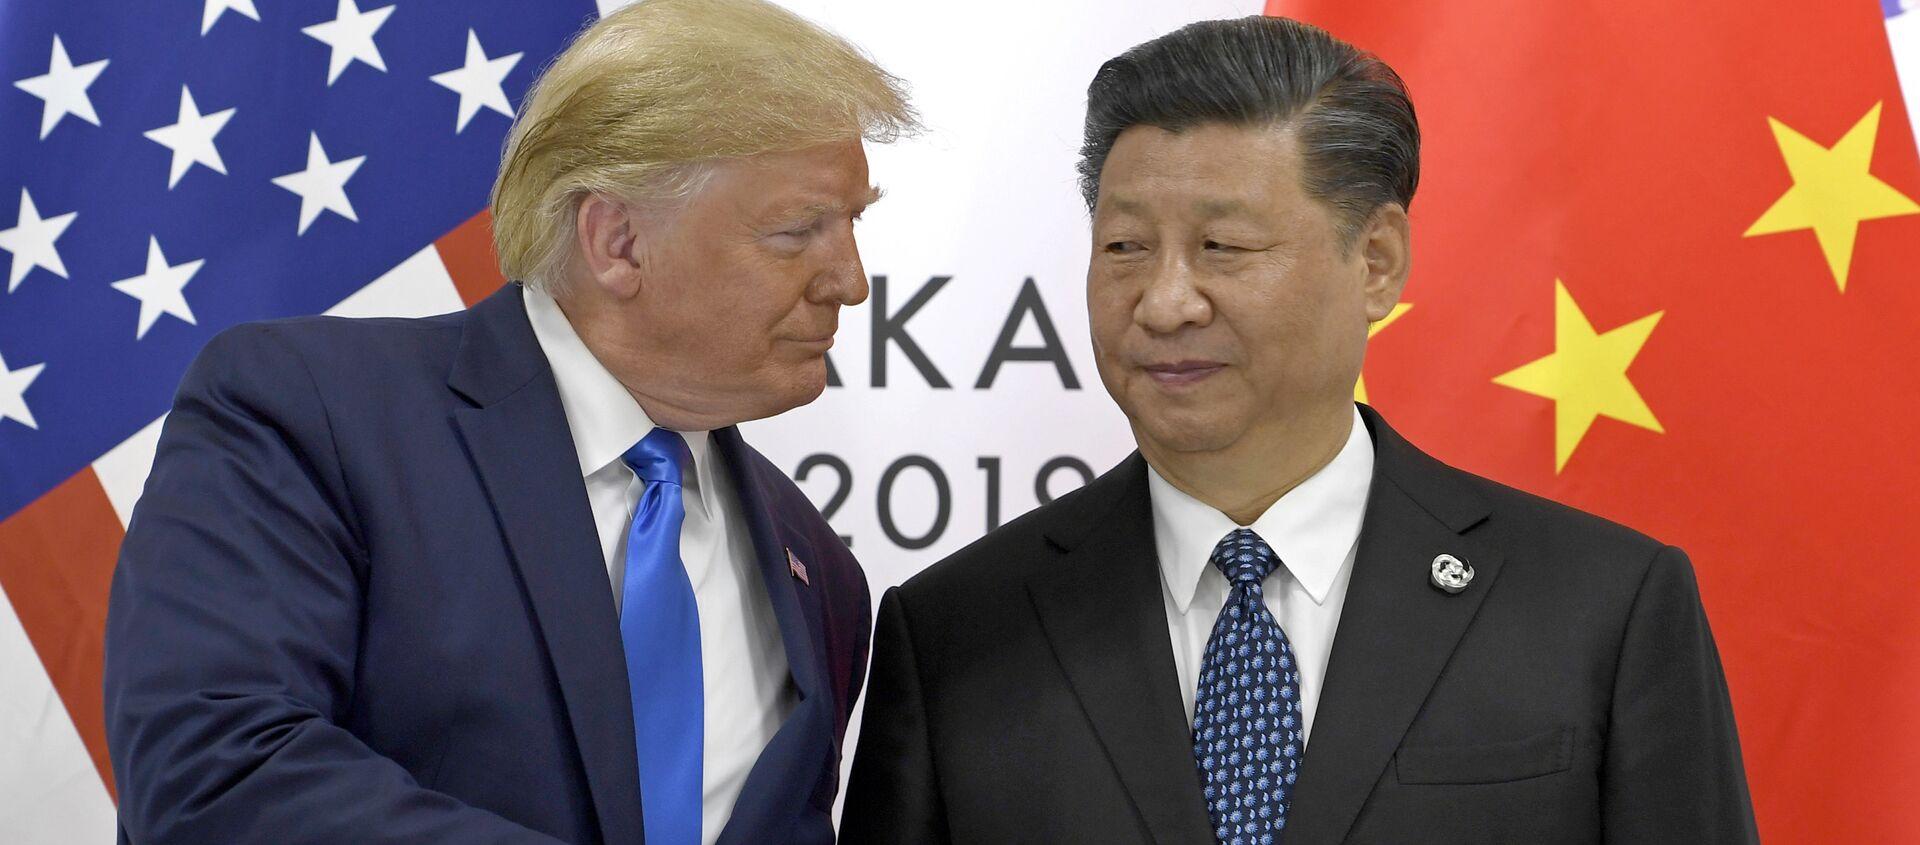 Президент США Дональд Трамп и глава КНР Си Цзиньпин на встрече в рамках саммита G20 в Осаке - Sputnik Азербайджан, 1920, 31.10.2020